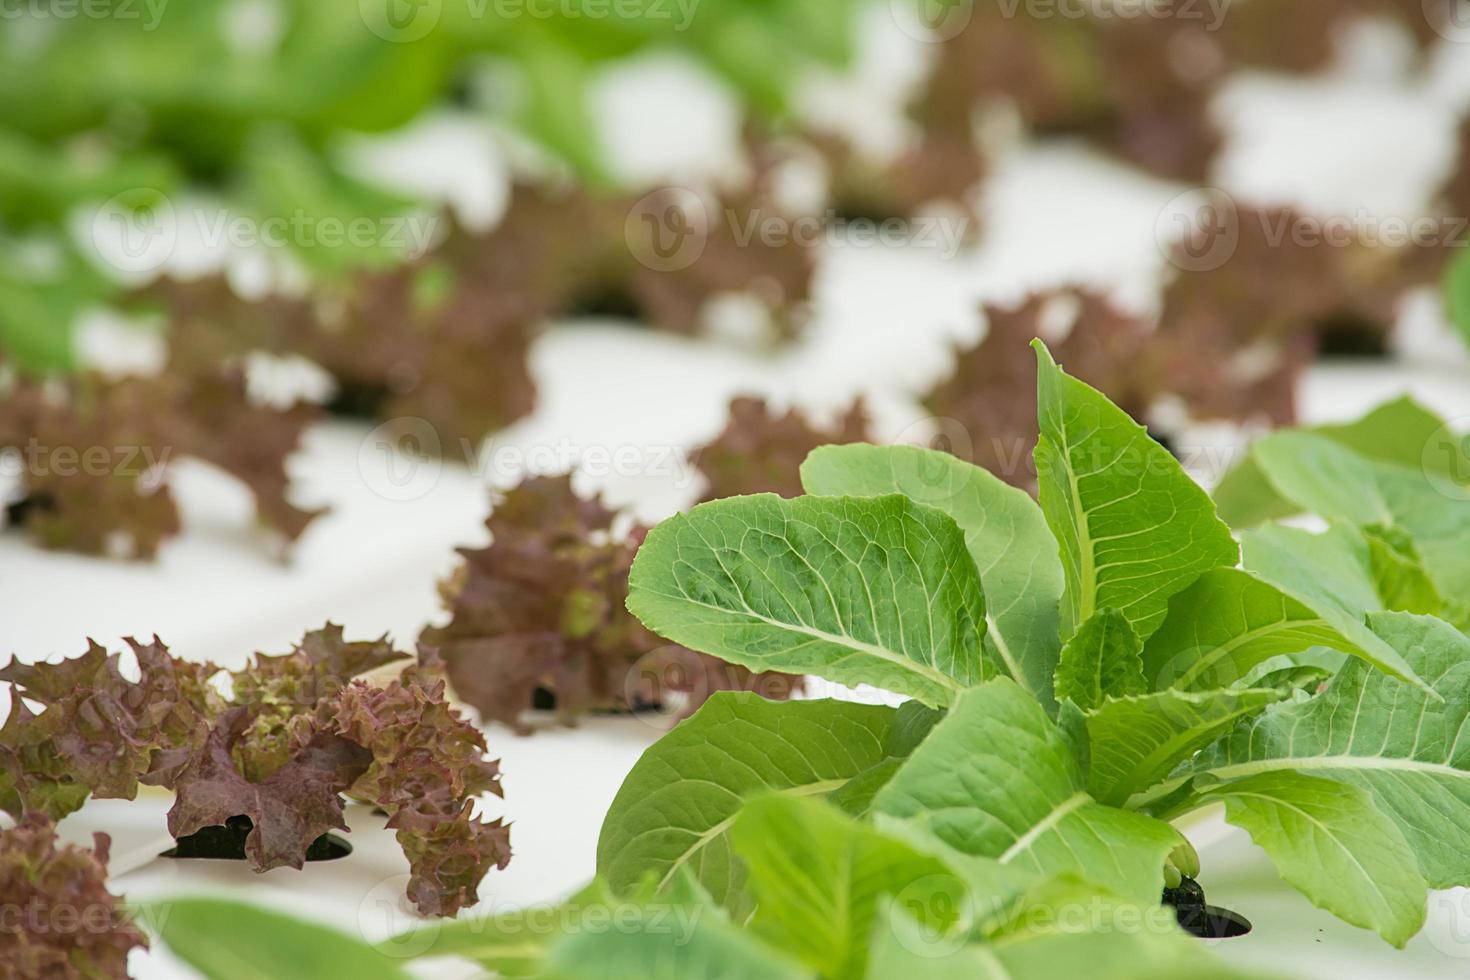 verdura idroponica organica. foto